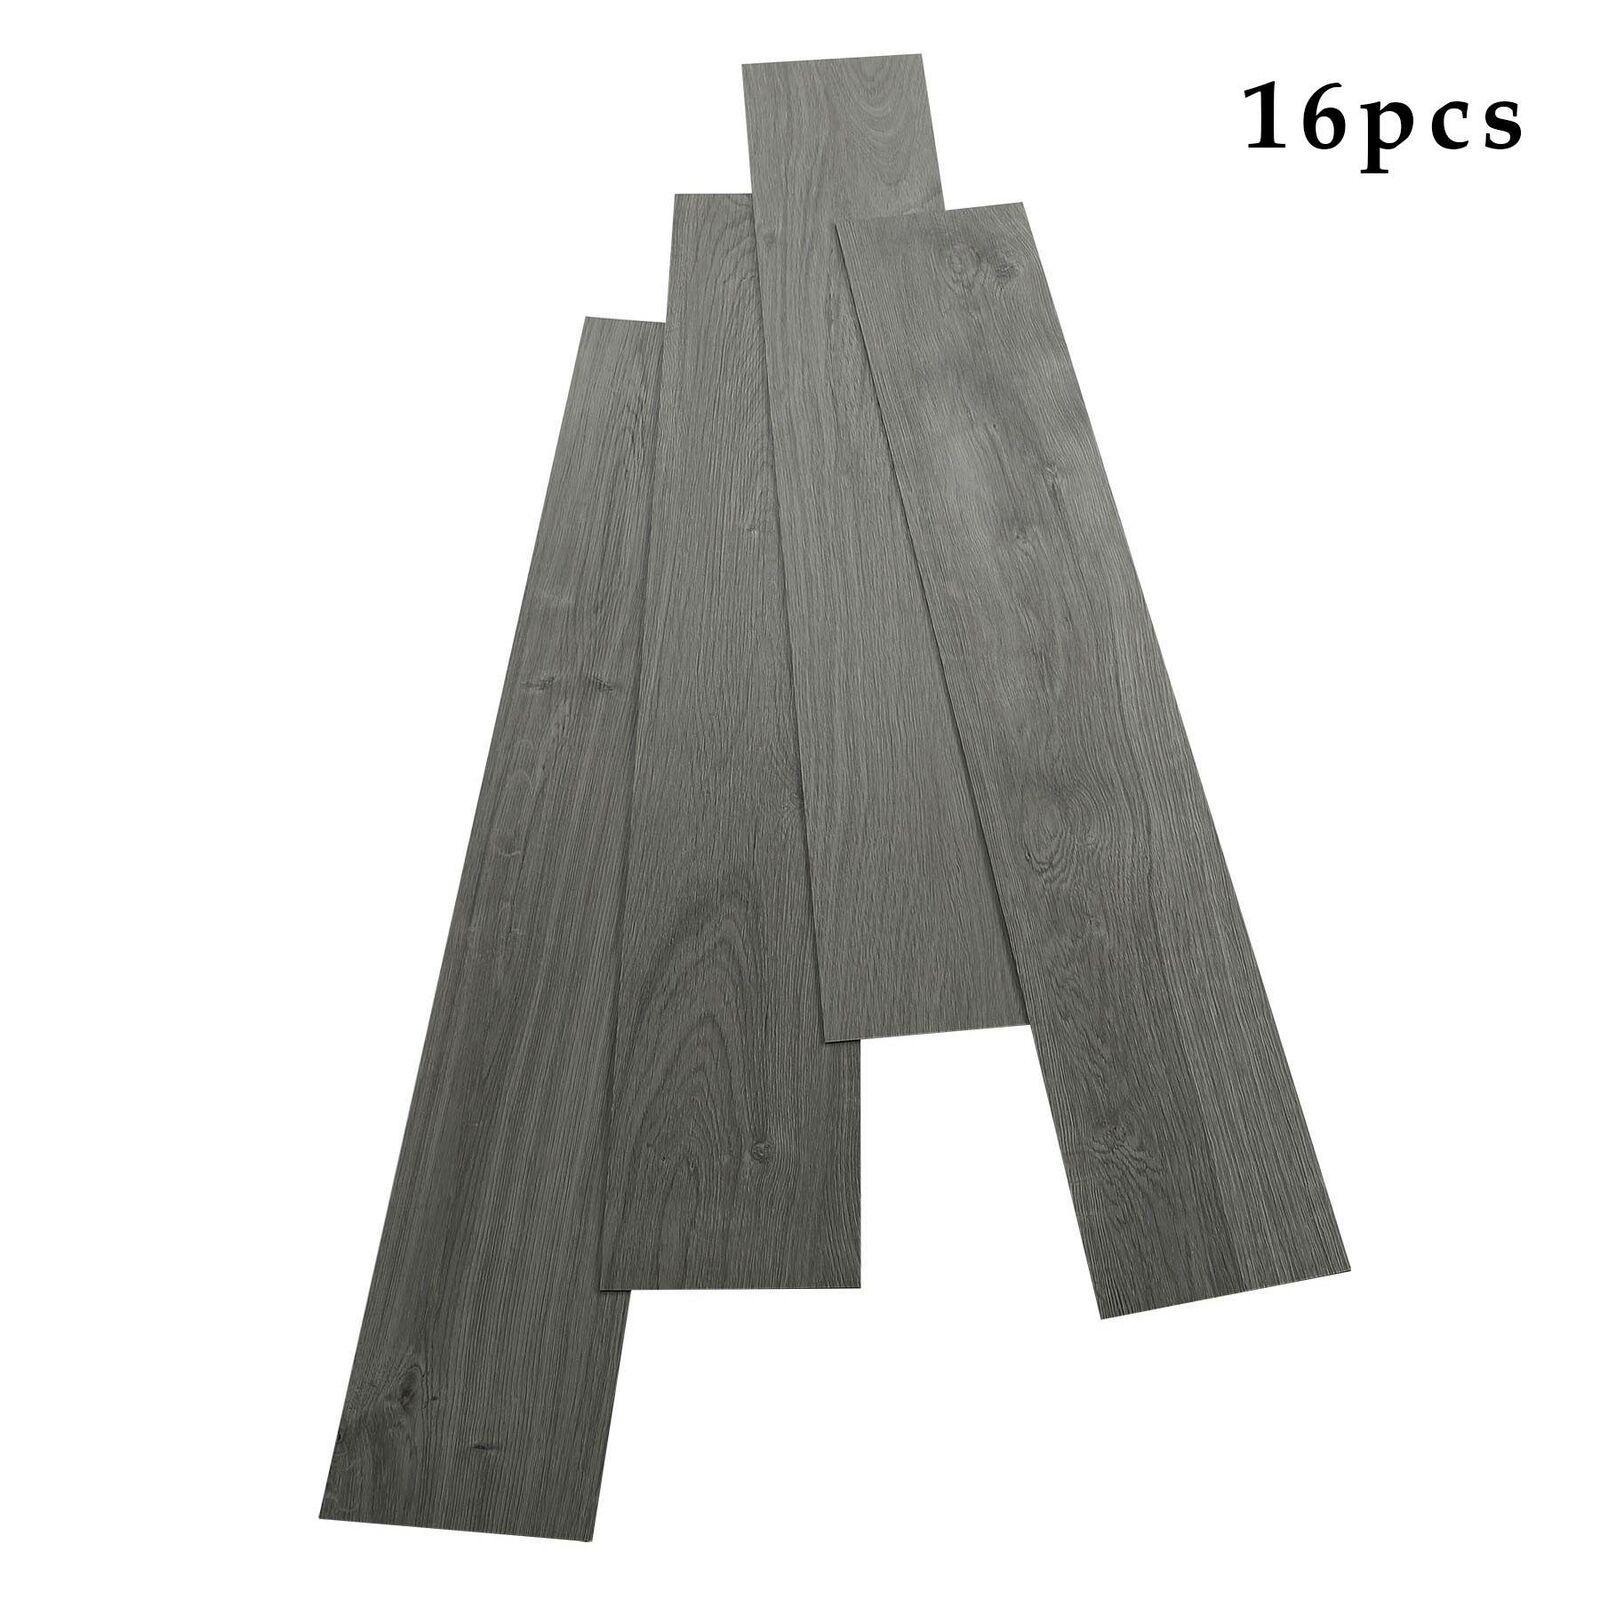 16 Pcs Formaldehyde Free Vinyl Floor Planks Adhesive Floor Tiles 2 0mm Thick Vinyl Flooring Ideas Of Vi In 2020 Vinyl Flooring Adhesive Floor Tiles Plank Flooring